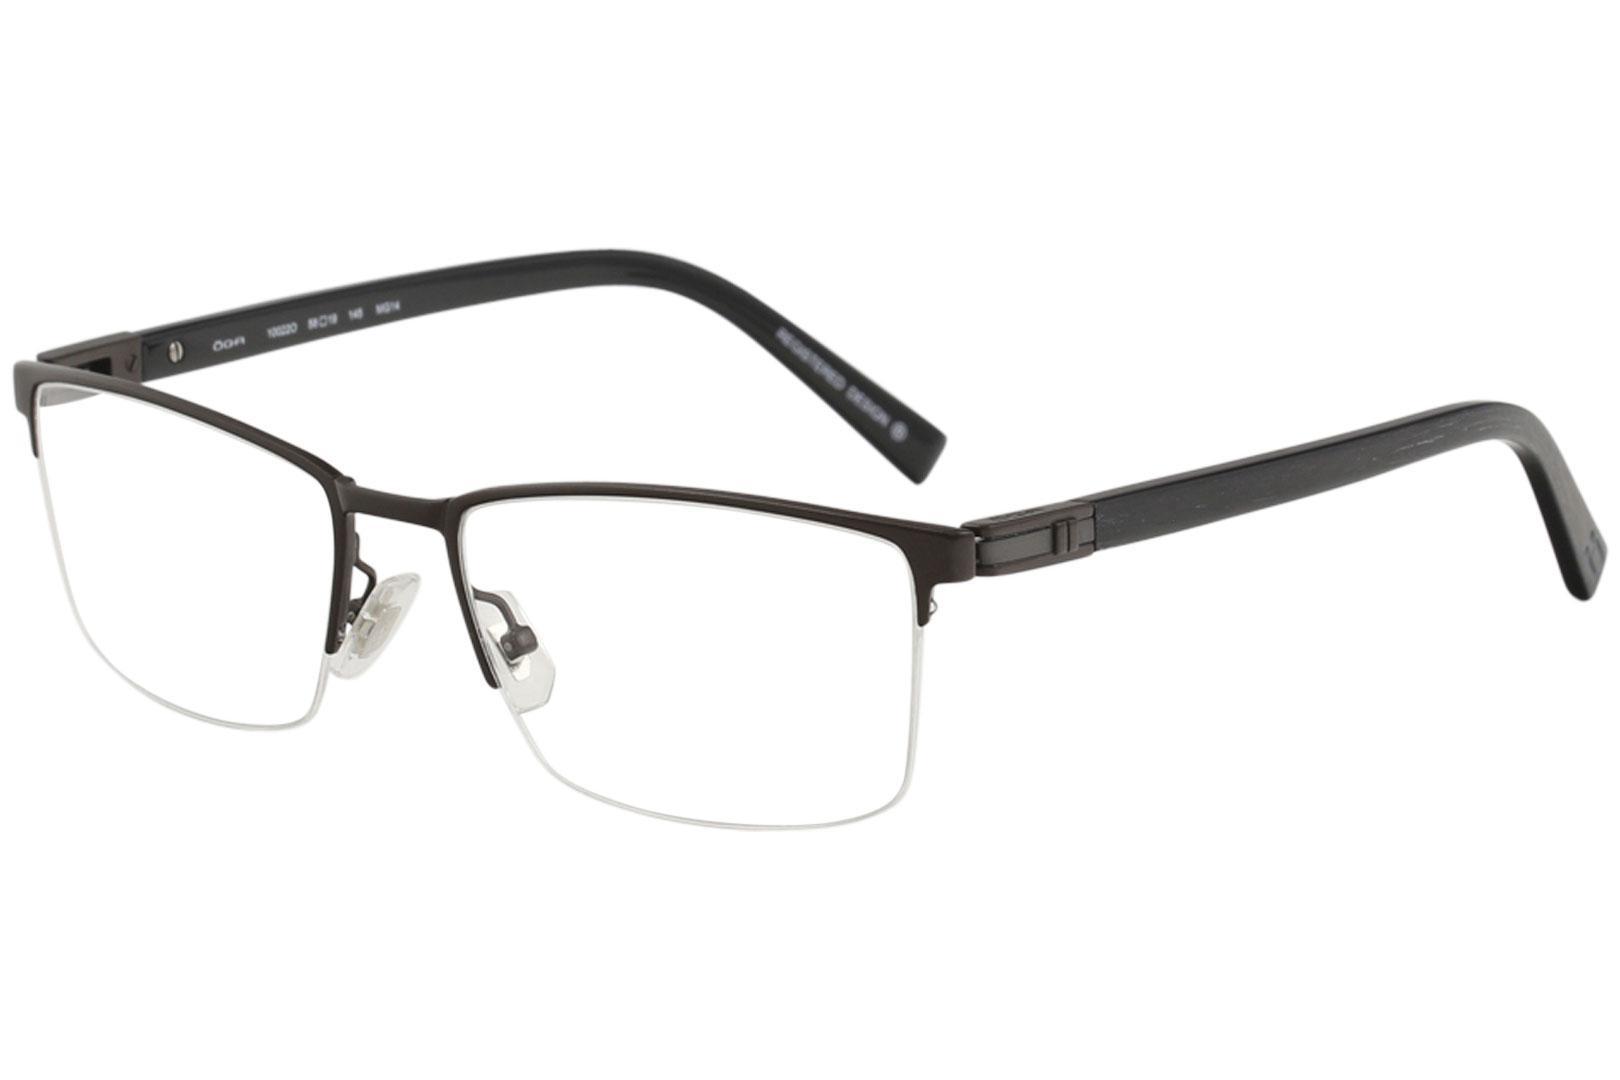 c436252de77 Morel Men s Eyeglasses OGA 10009O 10009 O Full Rim Optical Frame by Morel.  Retro Round Clear Lens Glasses ...